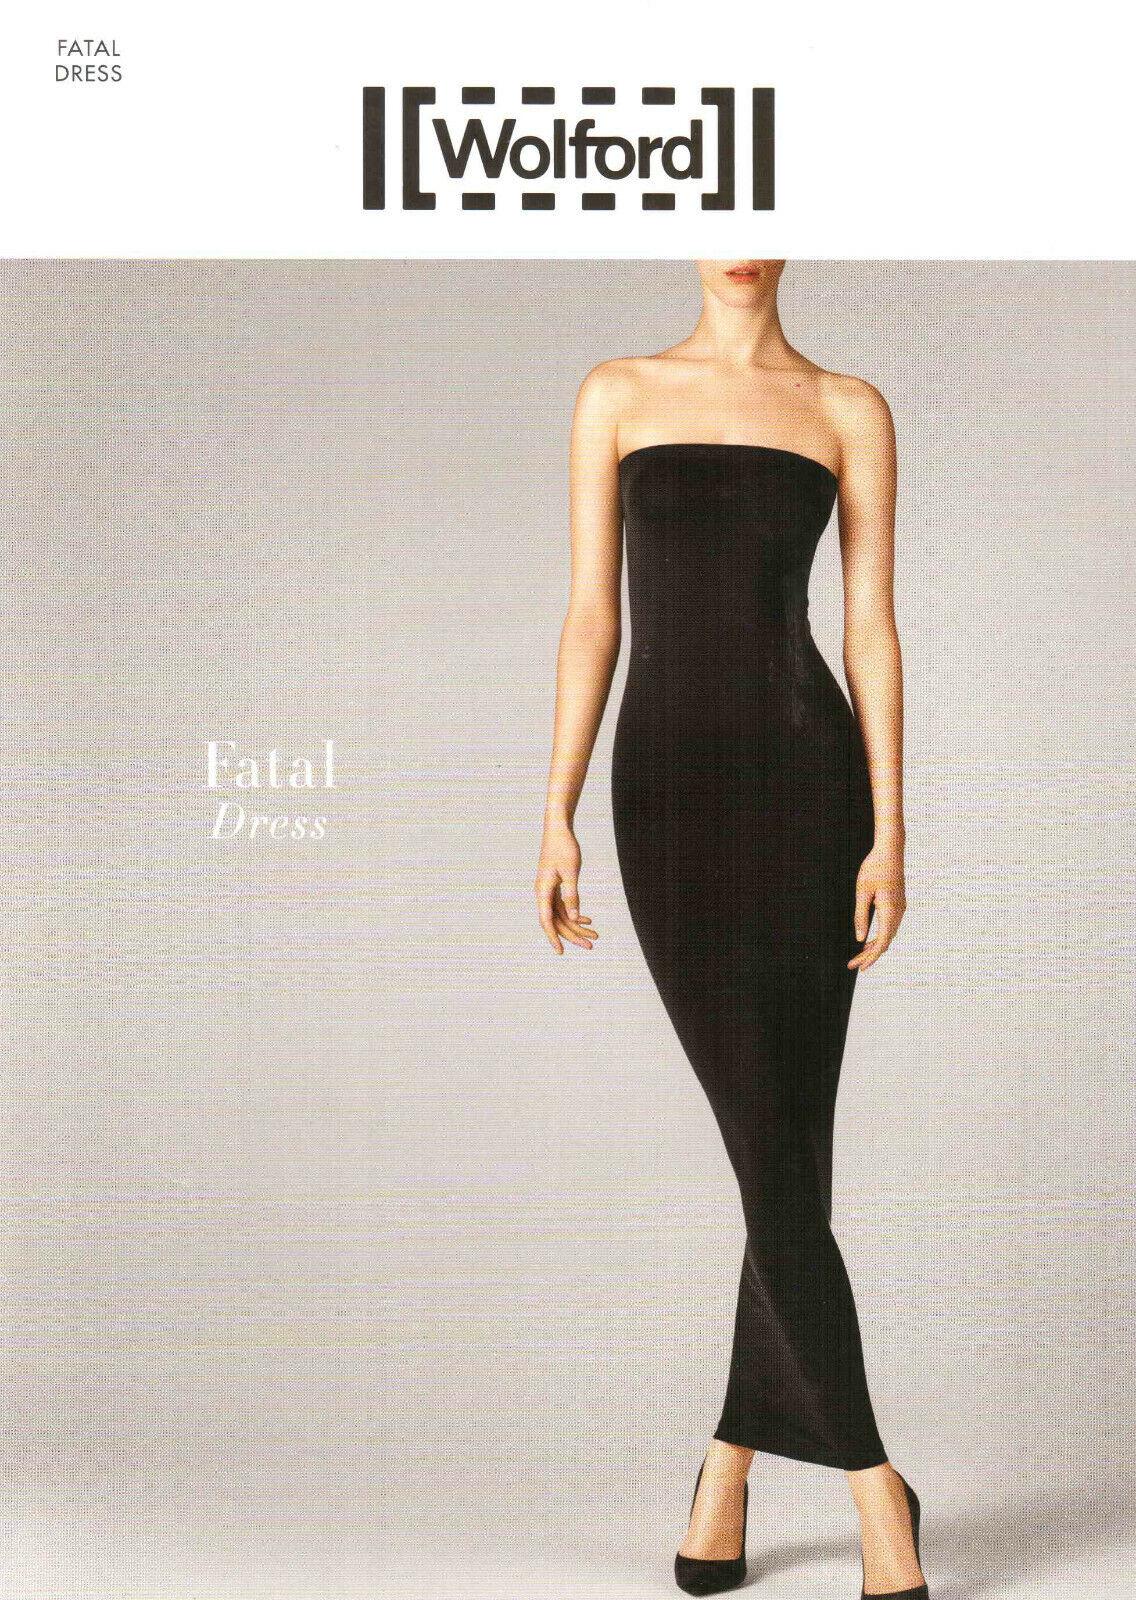 LUXUS PUR  WOLFORD Dress FATAL (50706), S, lipstick, NEU&OVP, 145,00 Euro